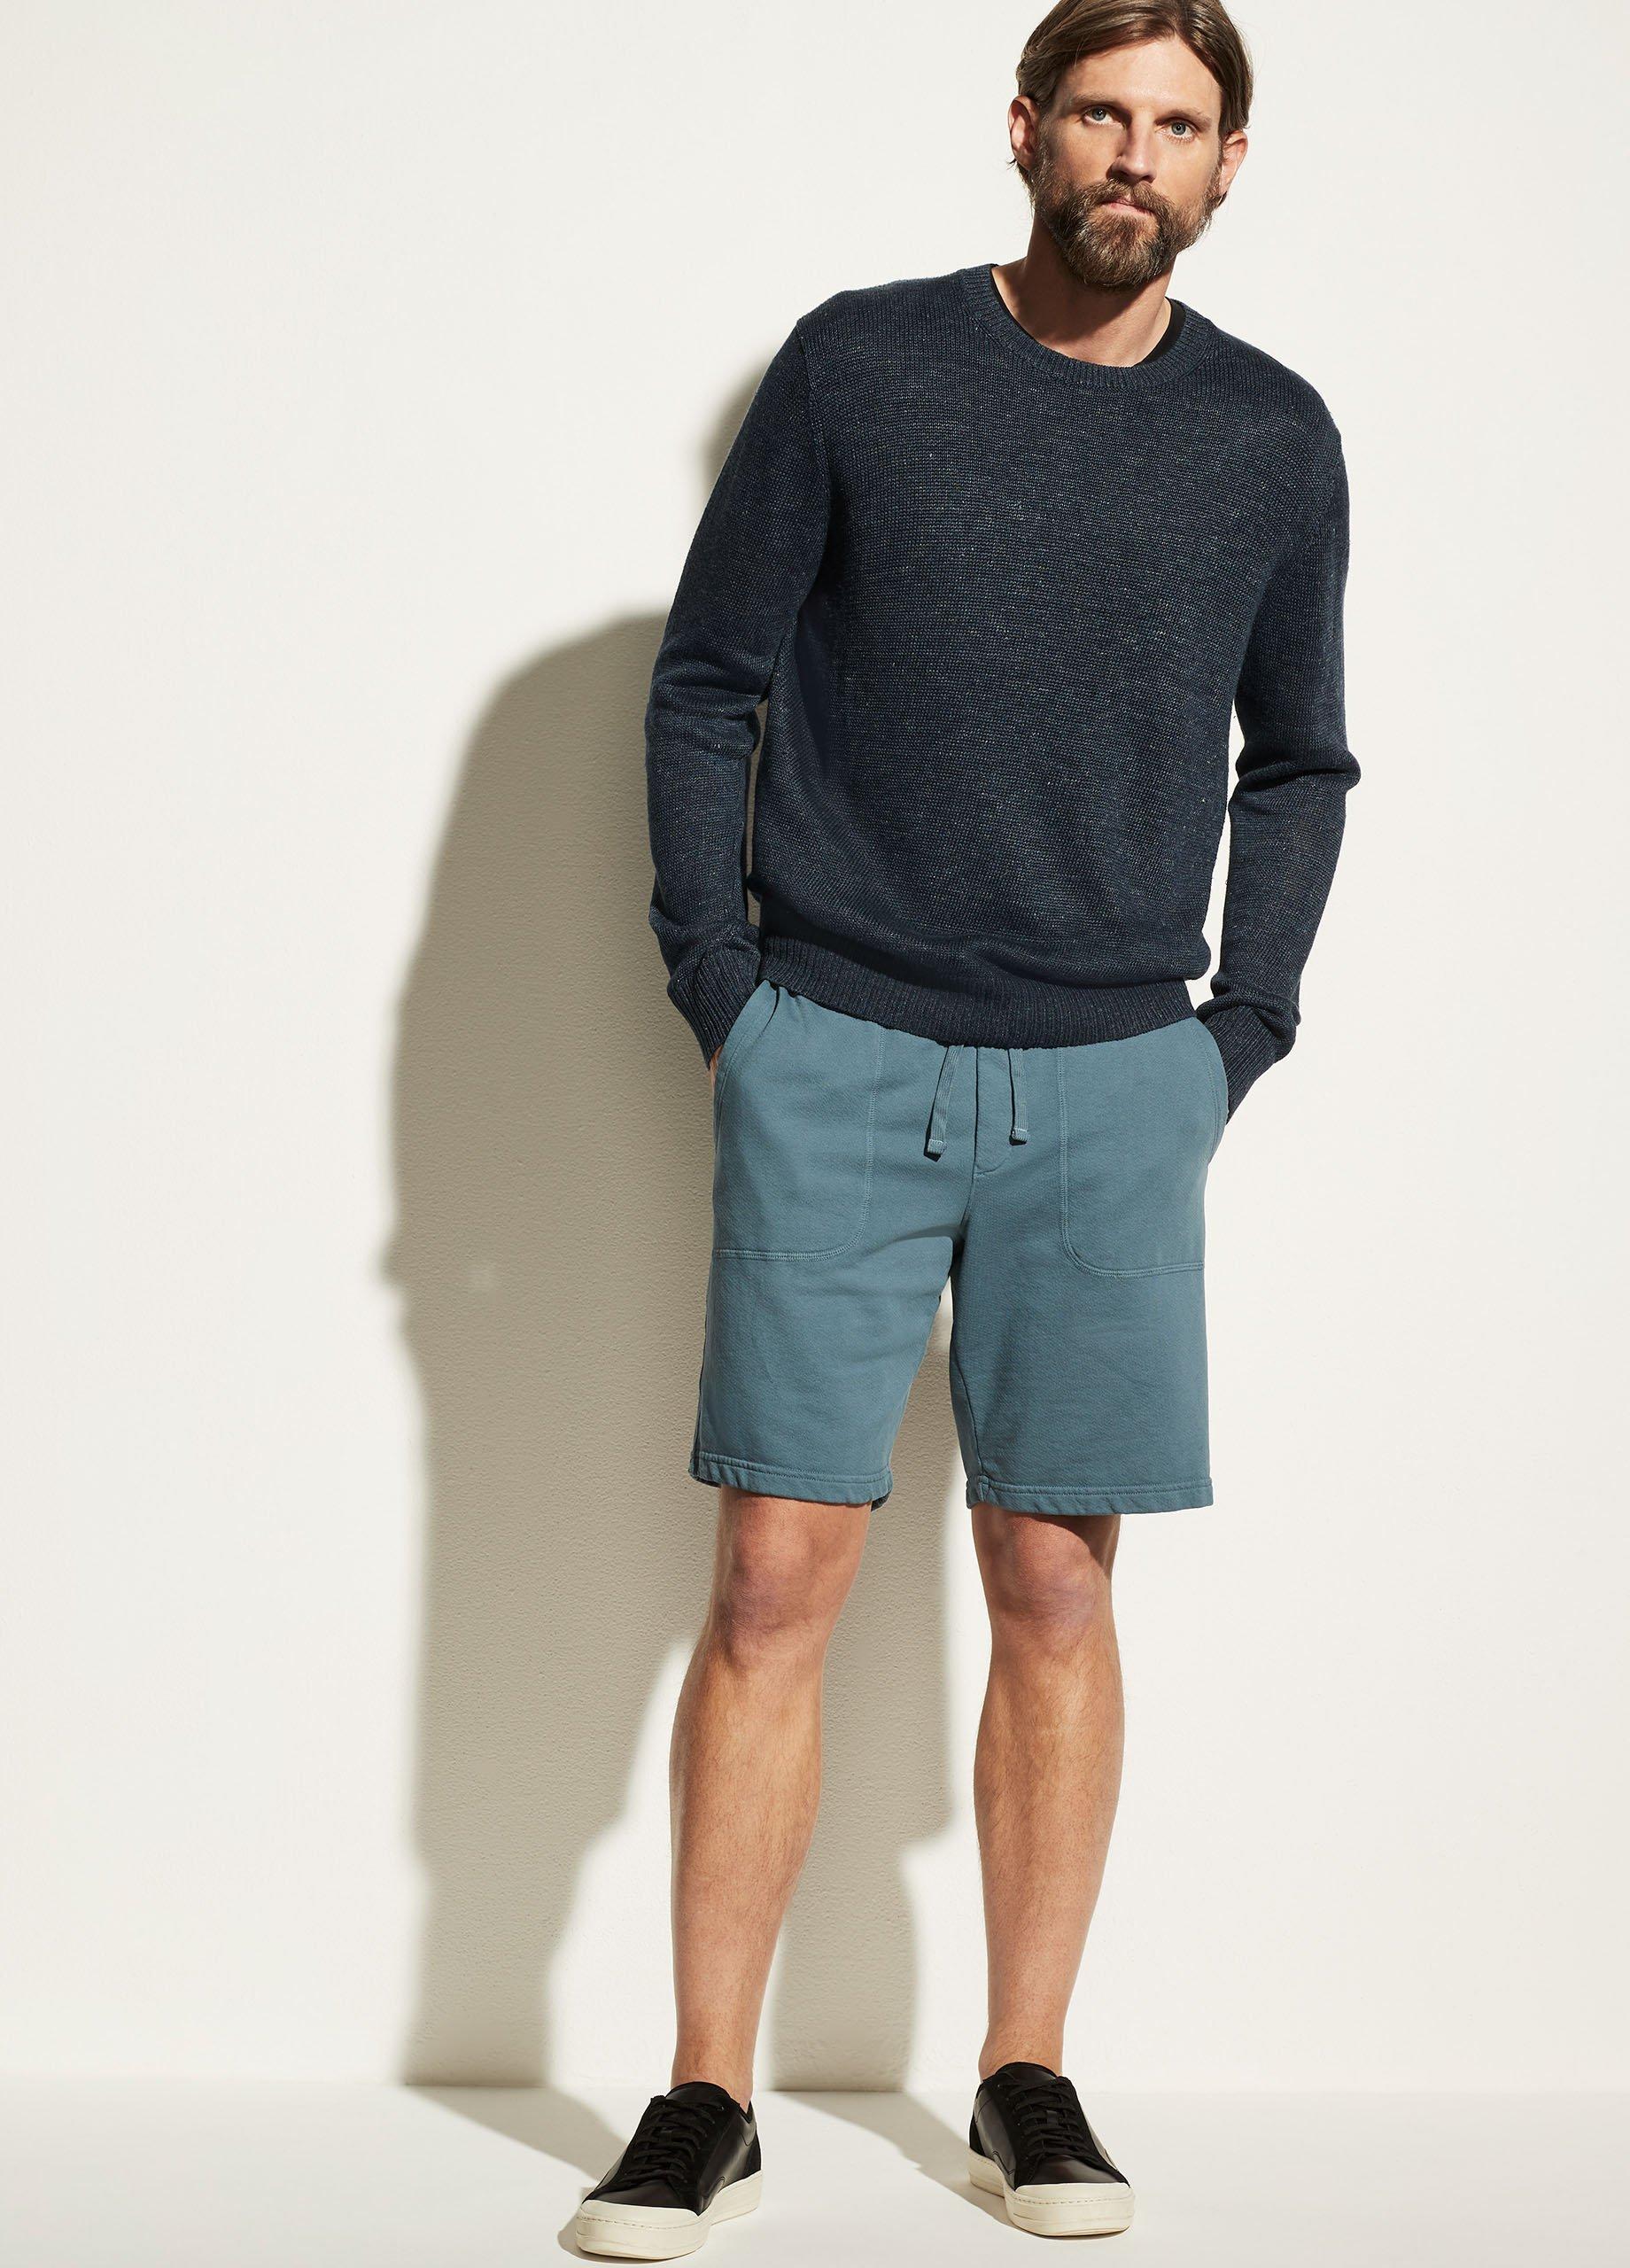 French Terry Garment Dye Short